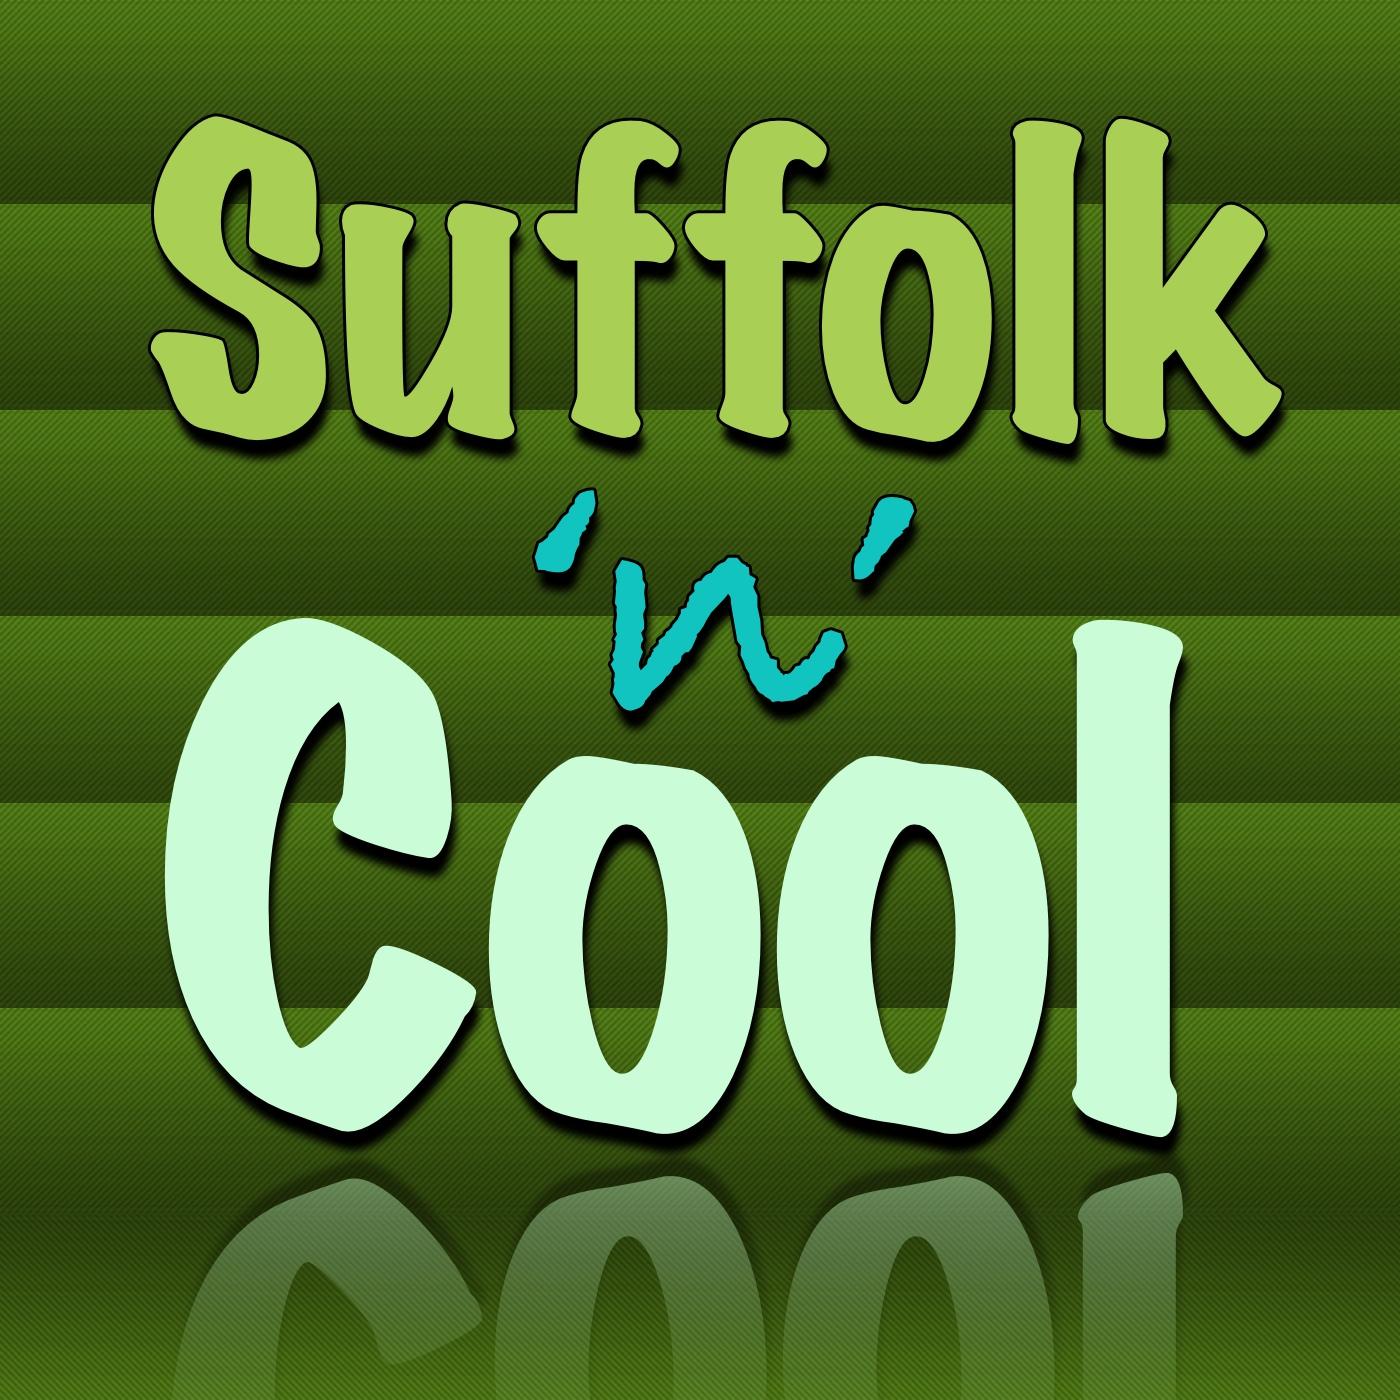 Suffolk 'n' Cool show art